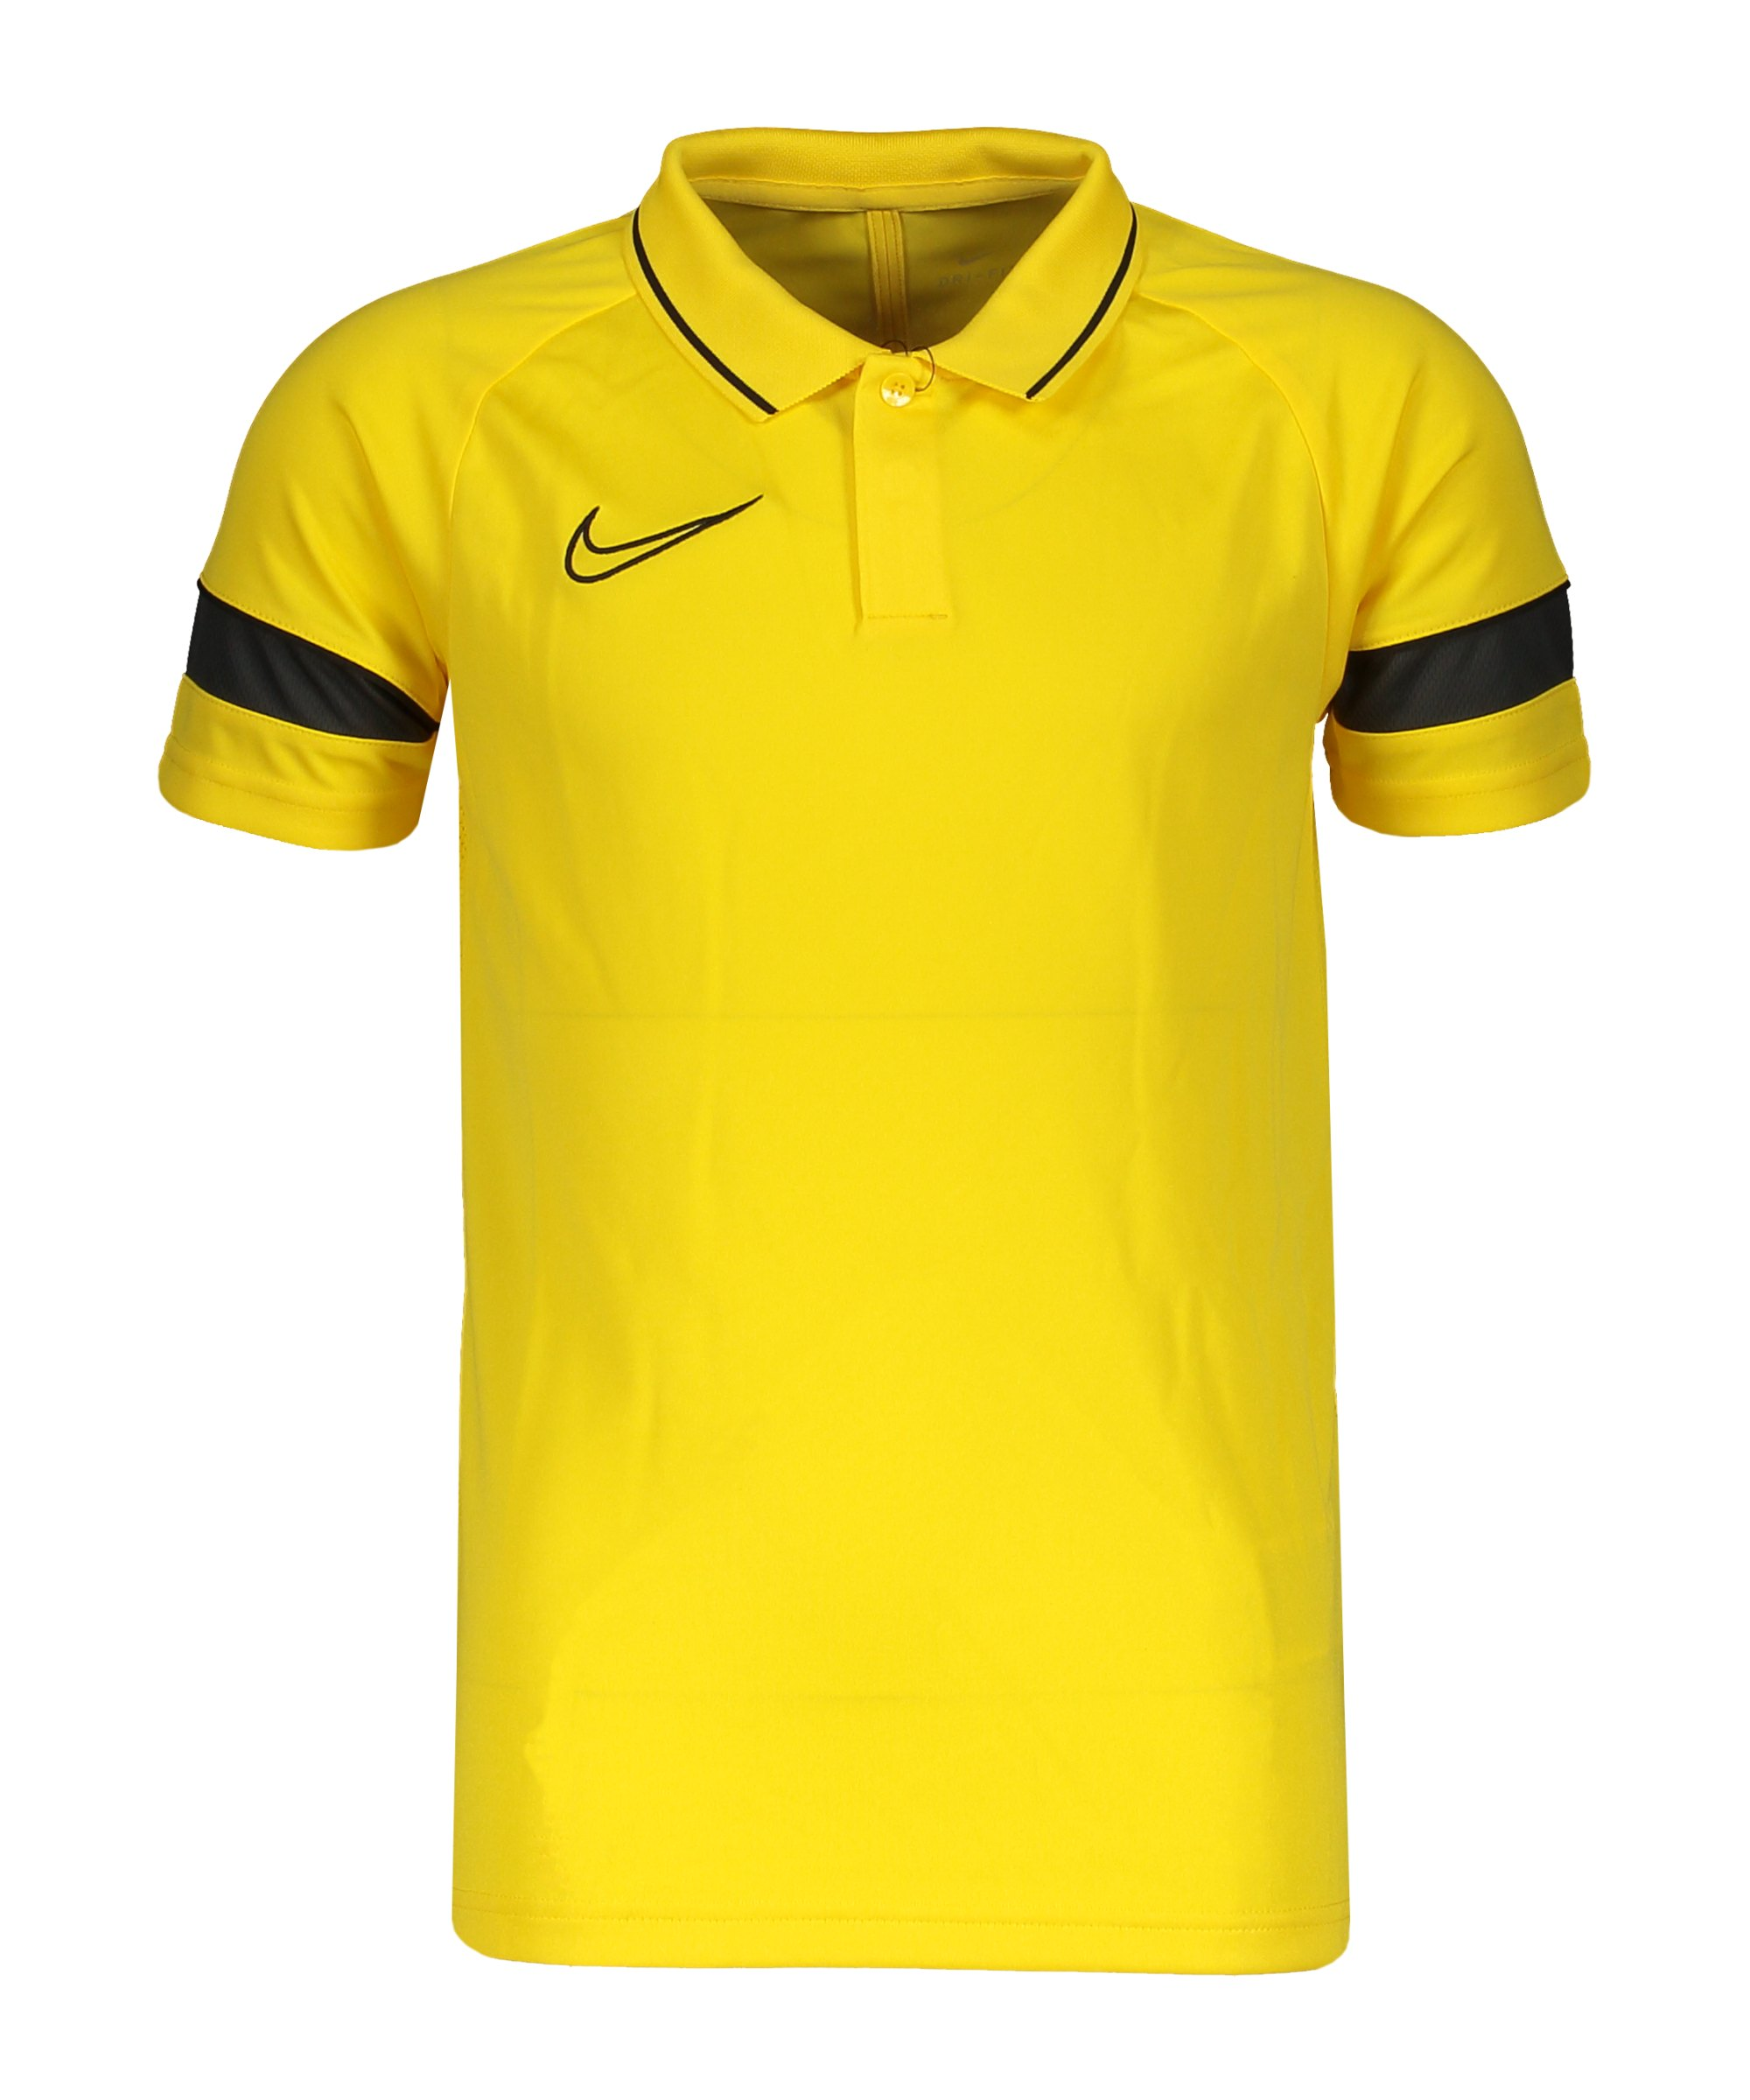 Nike Academy 21 Poloshirt Kids Gelb Schwarz F719 - gelb